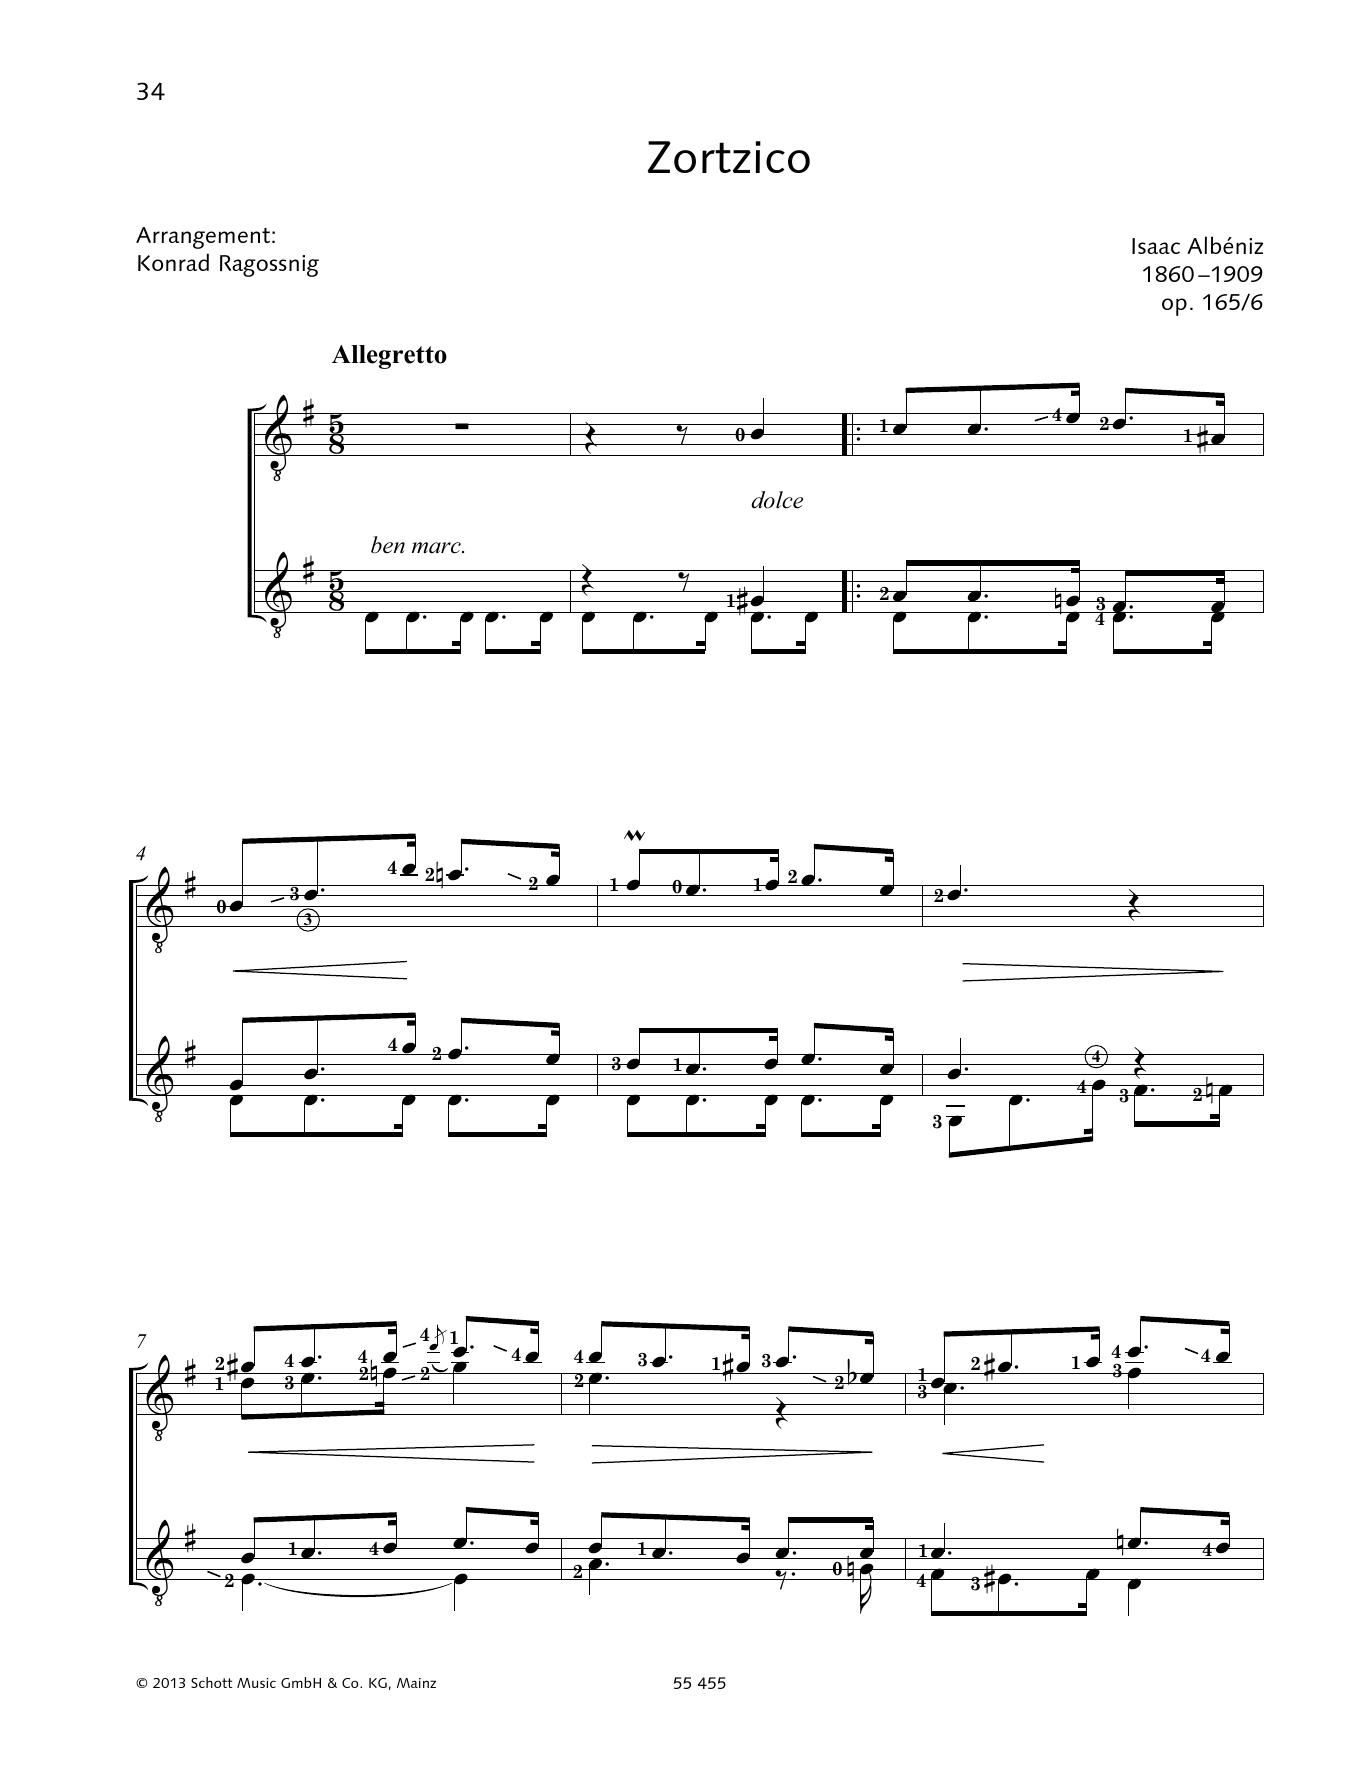 Zortzico - Full Score Sheet Music